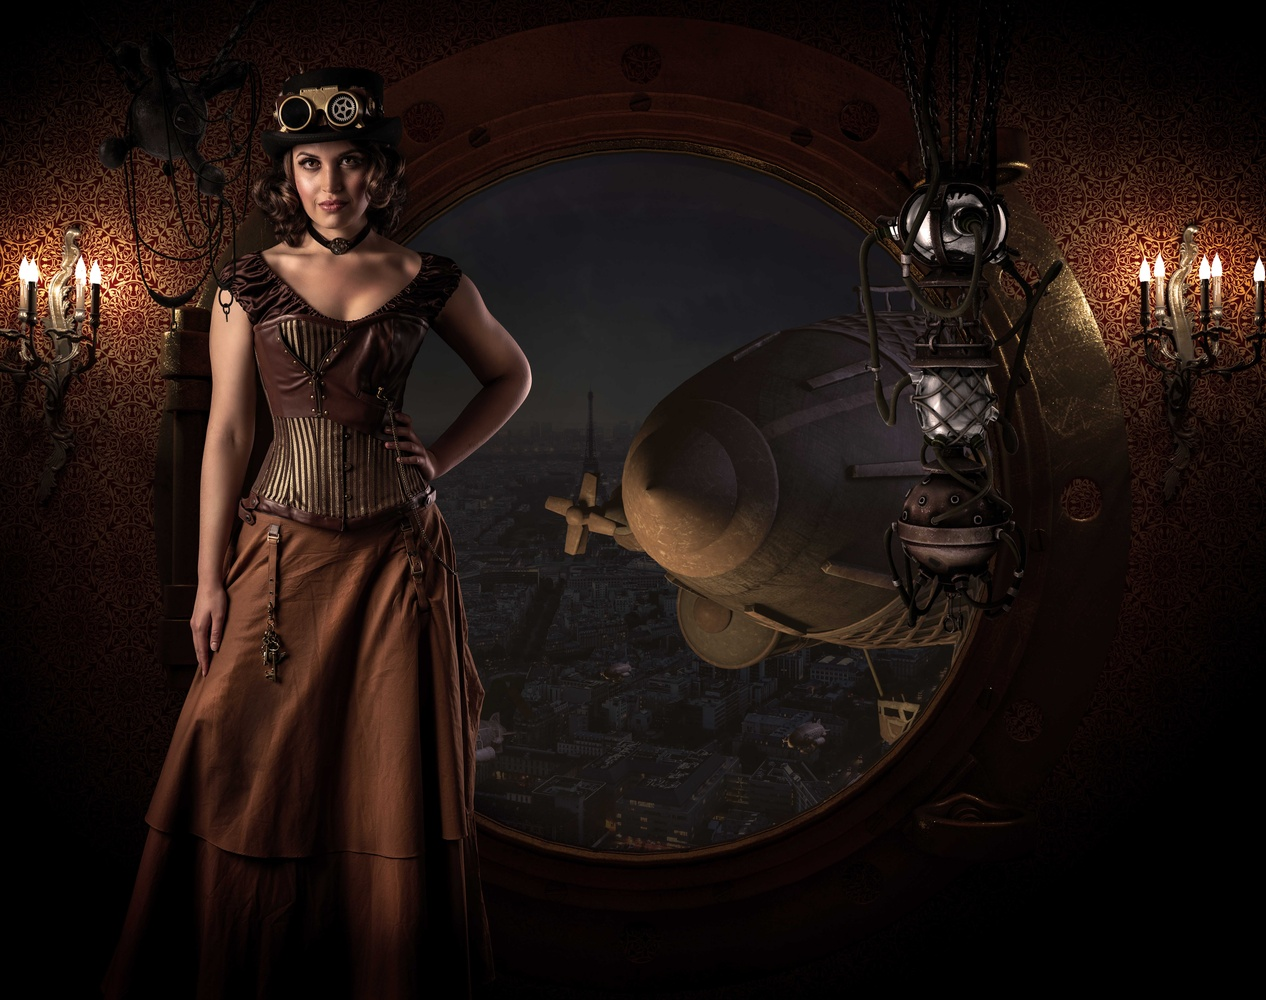 Steampunk Navigator by Dominic Deacon